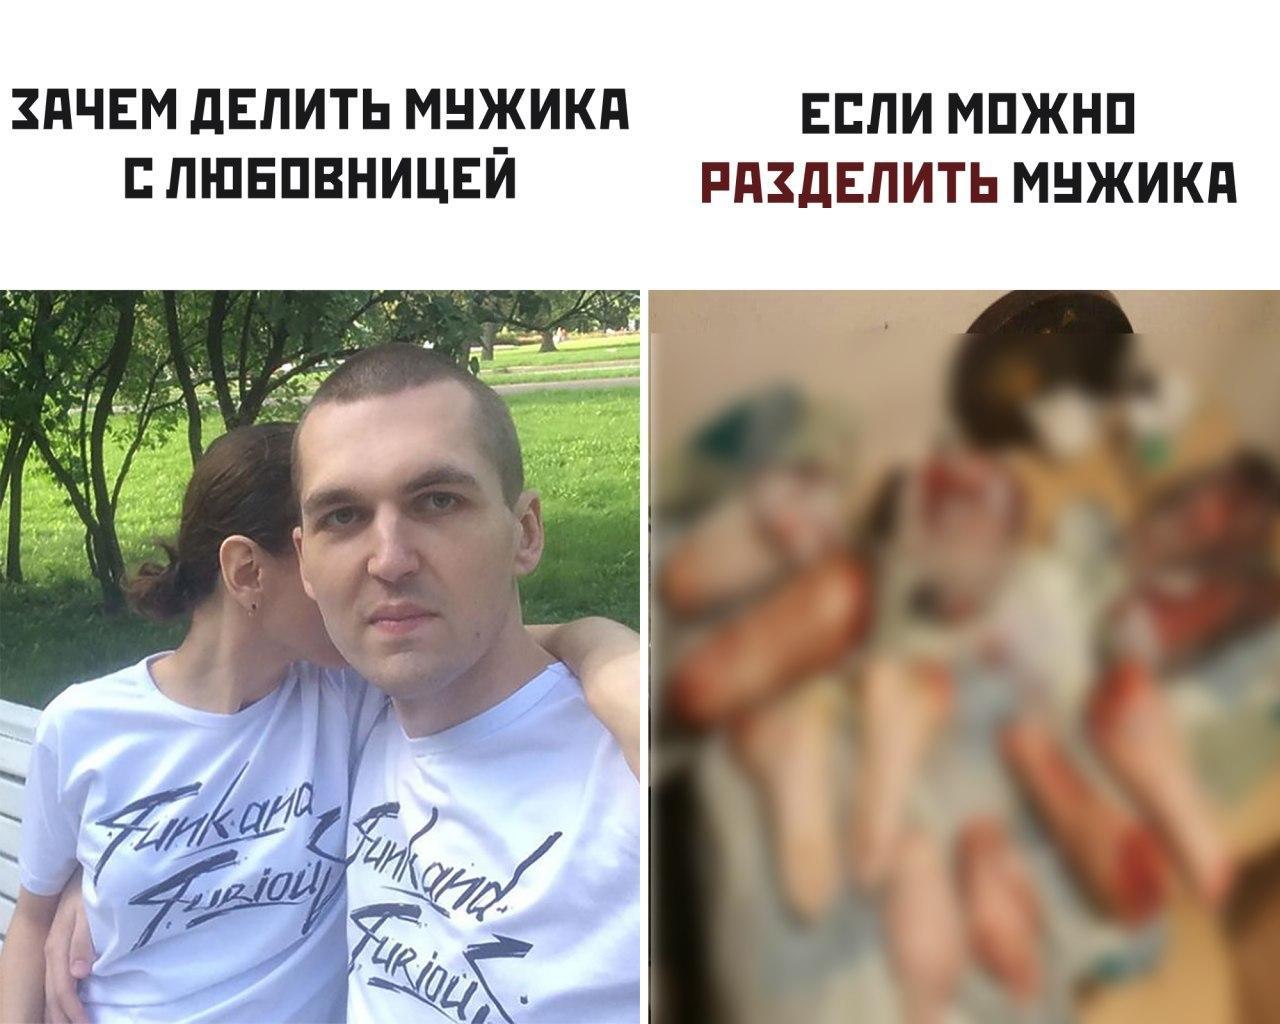 photo_2020-08-05_11-28-25.jpg